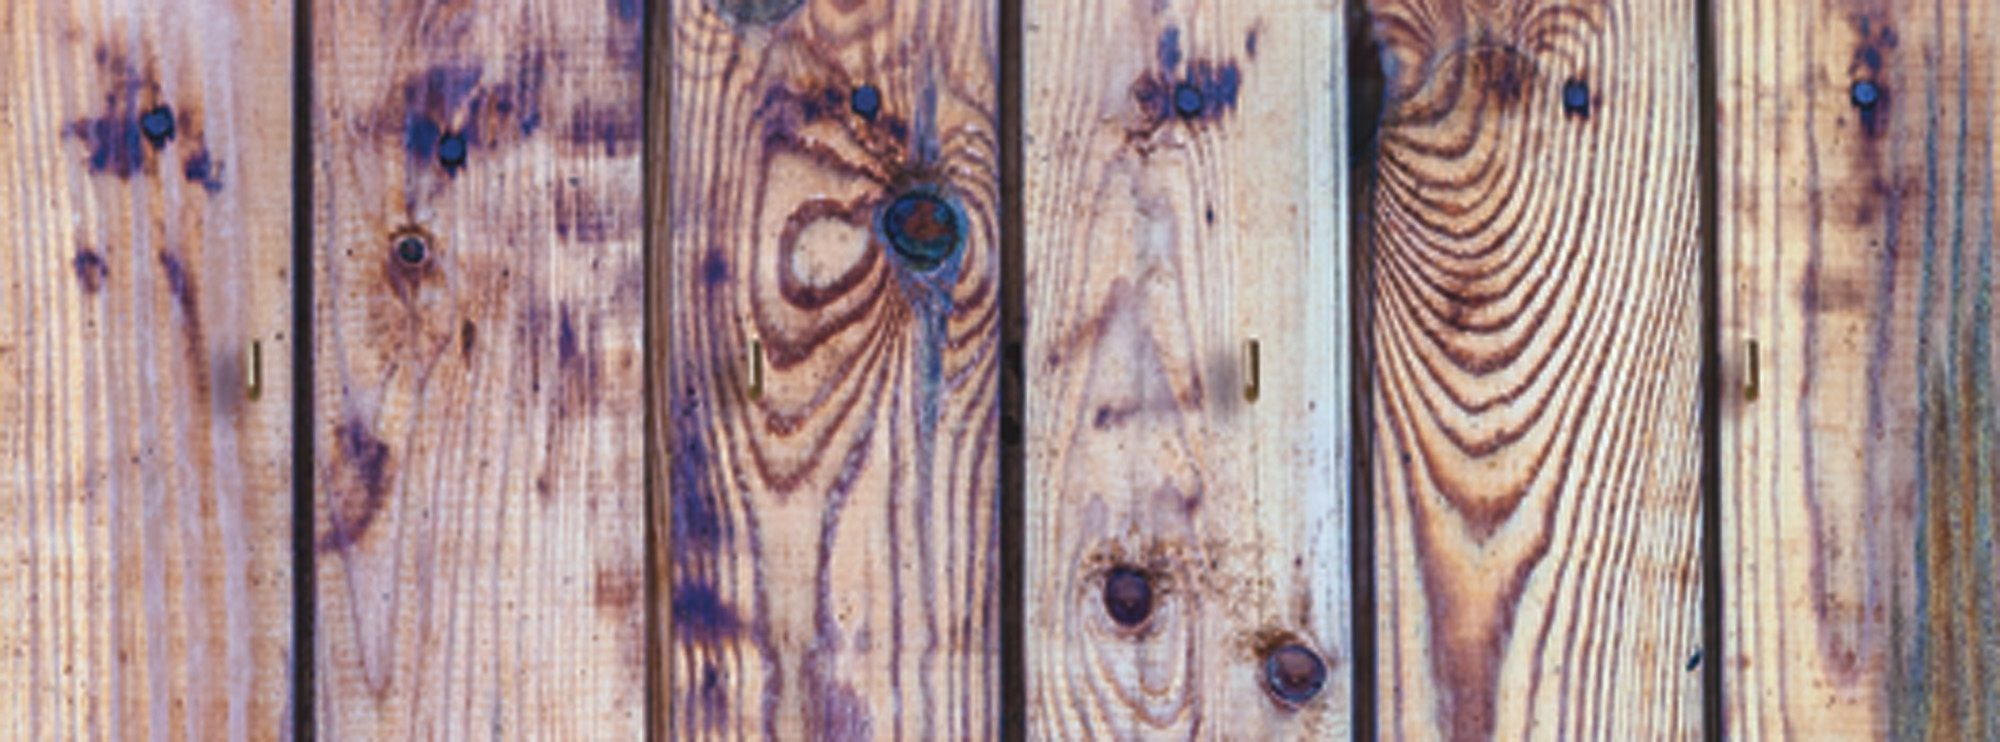 Schlüsselbrett, Home affaire, »Alte Holzwand«, 40/15 cm